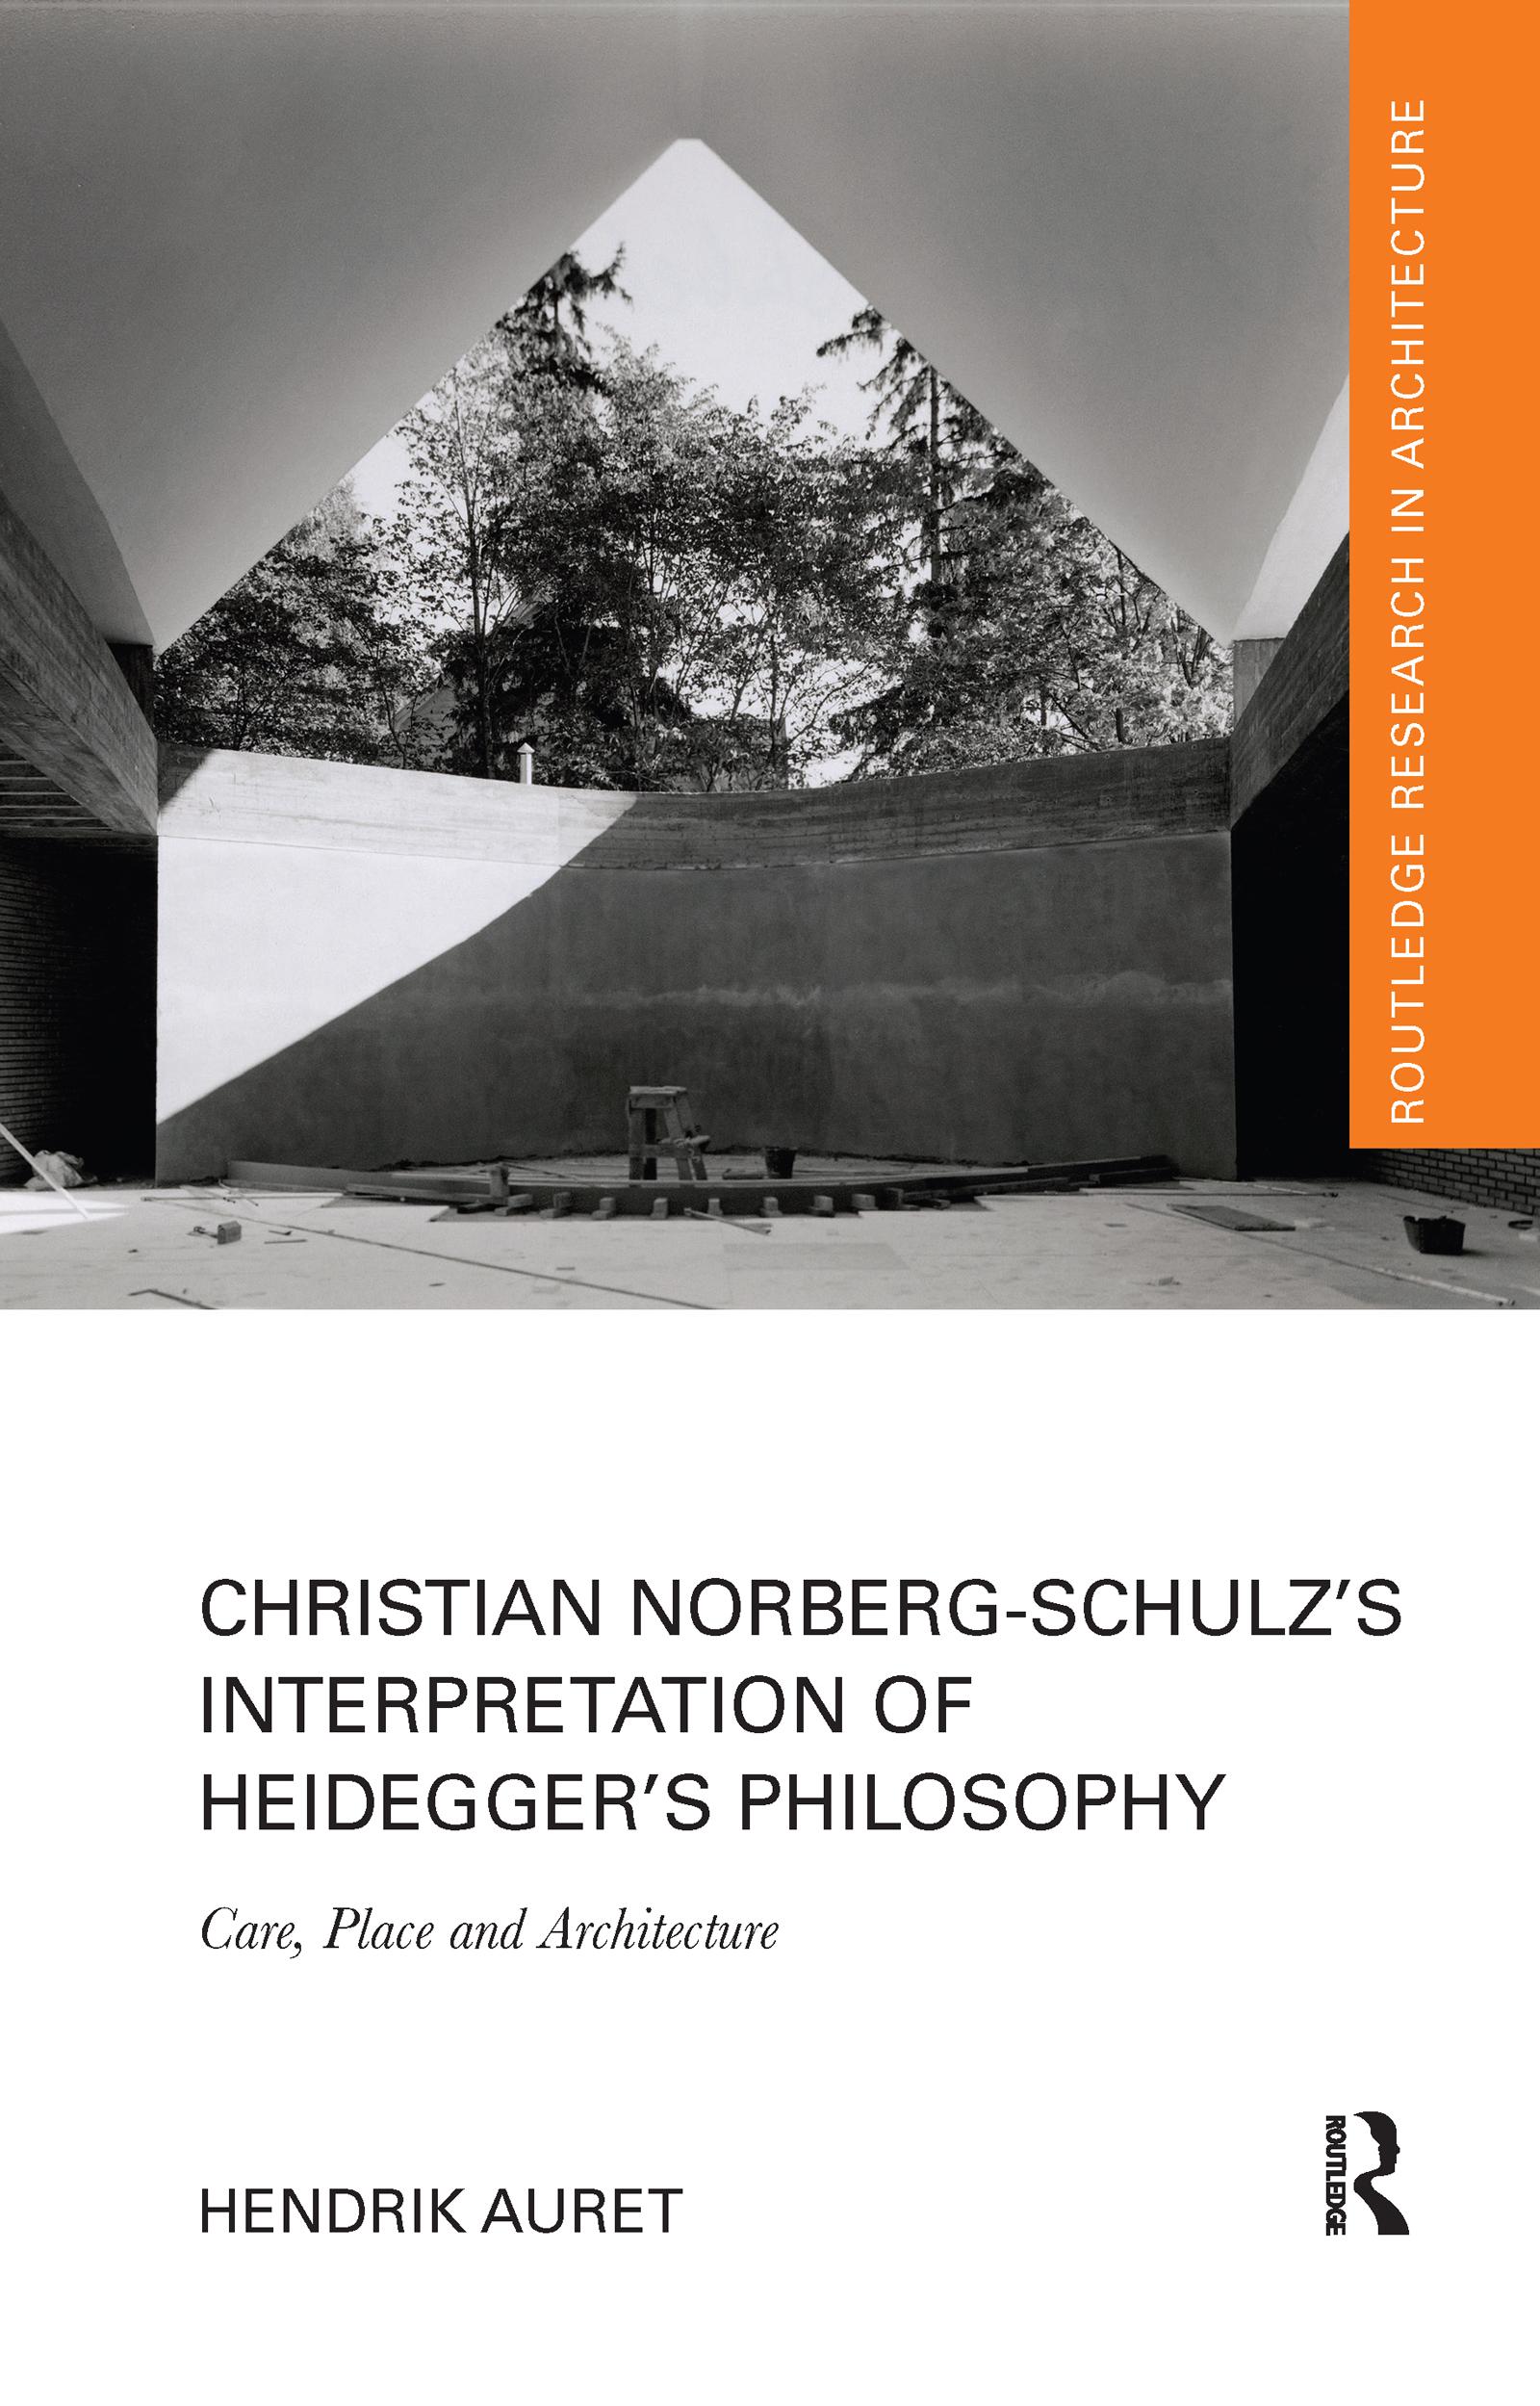 Christian Norberg-Schulz's Interpretation of Heidegger's Philosophy